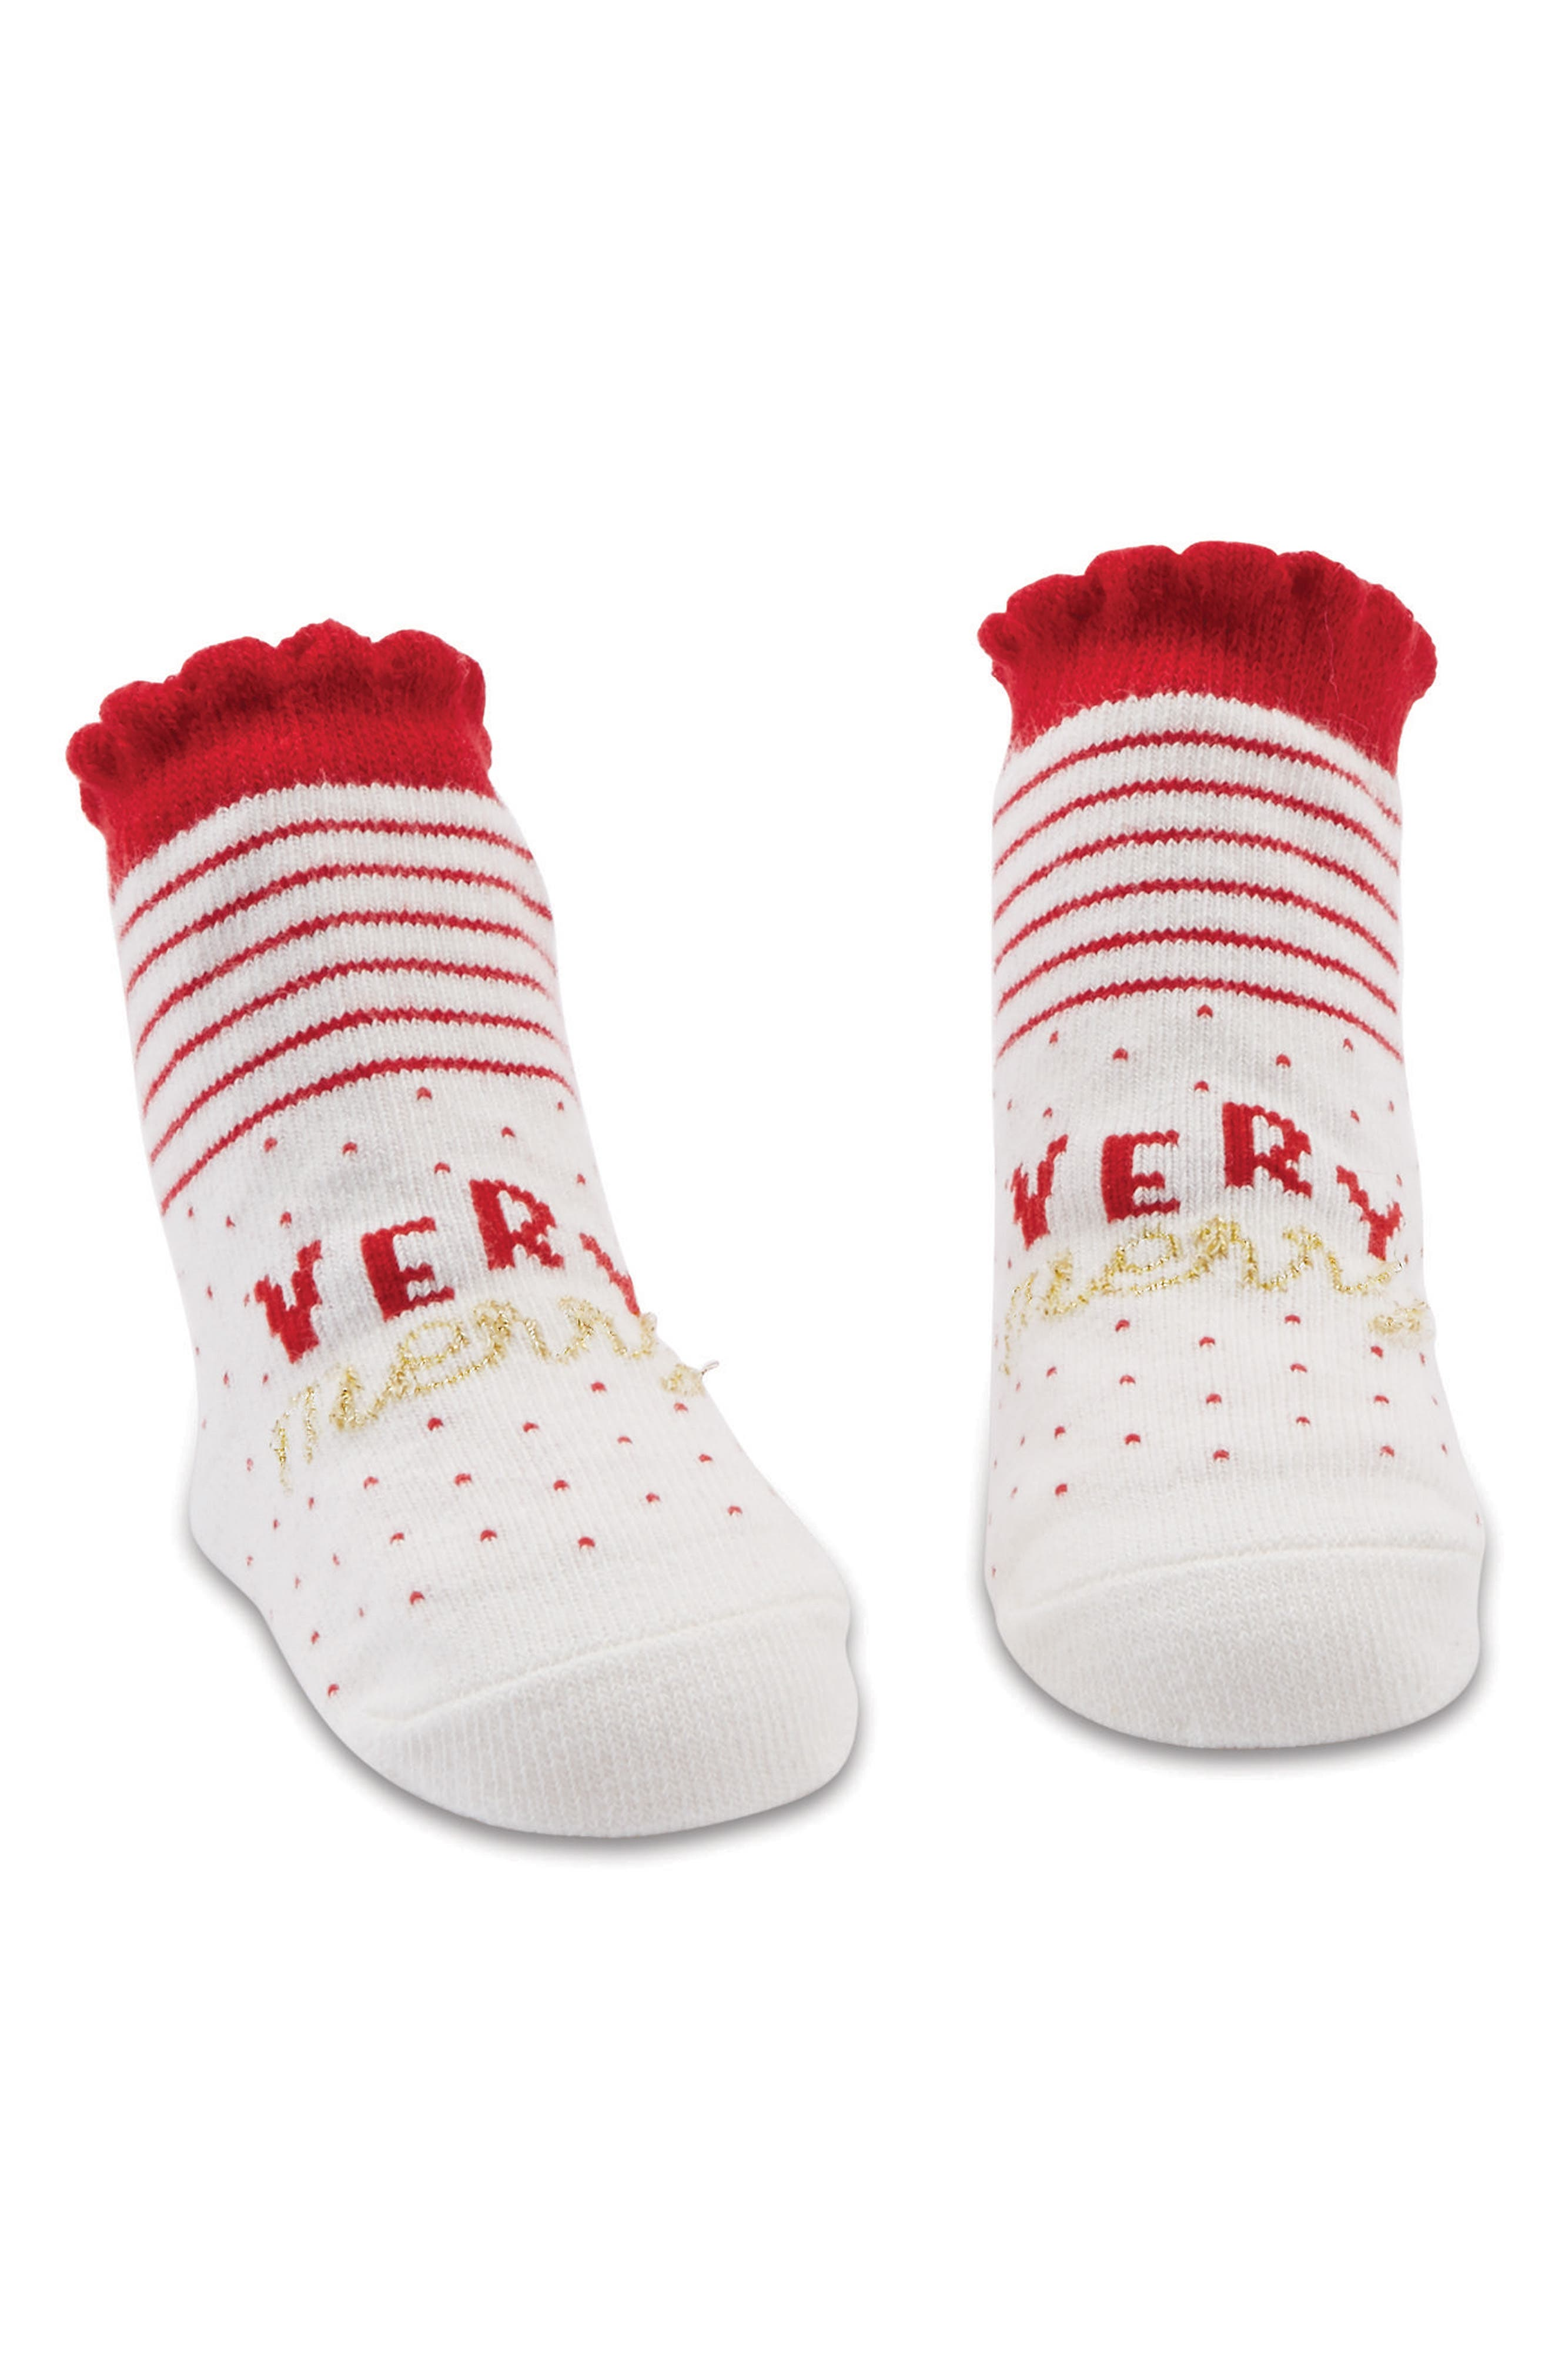 Very Merry Socks,                             Main thumbnail 1, color,                             600